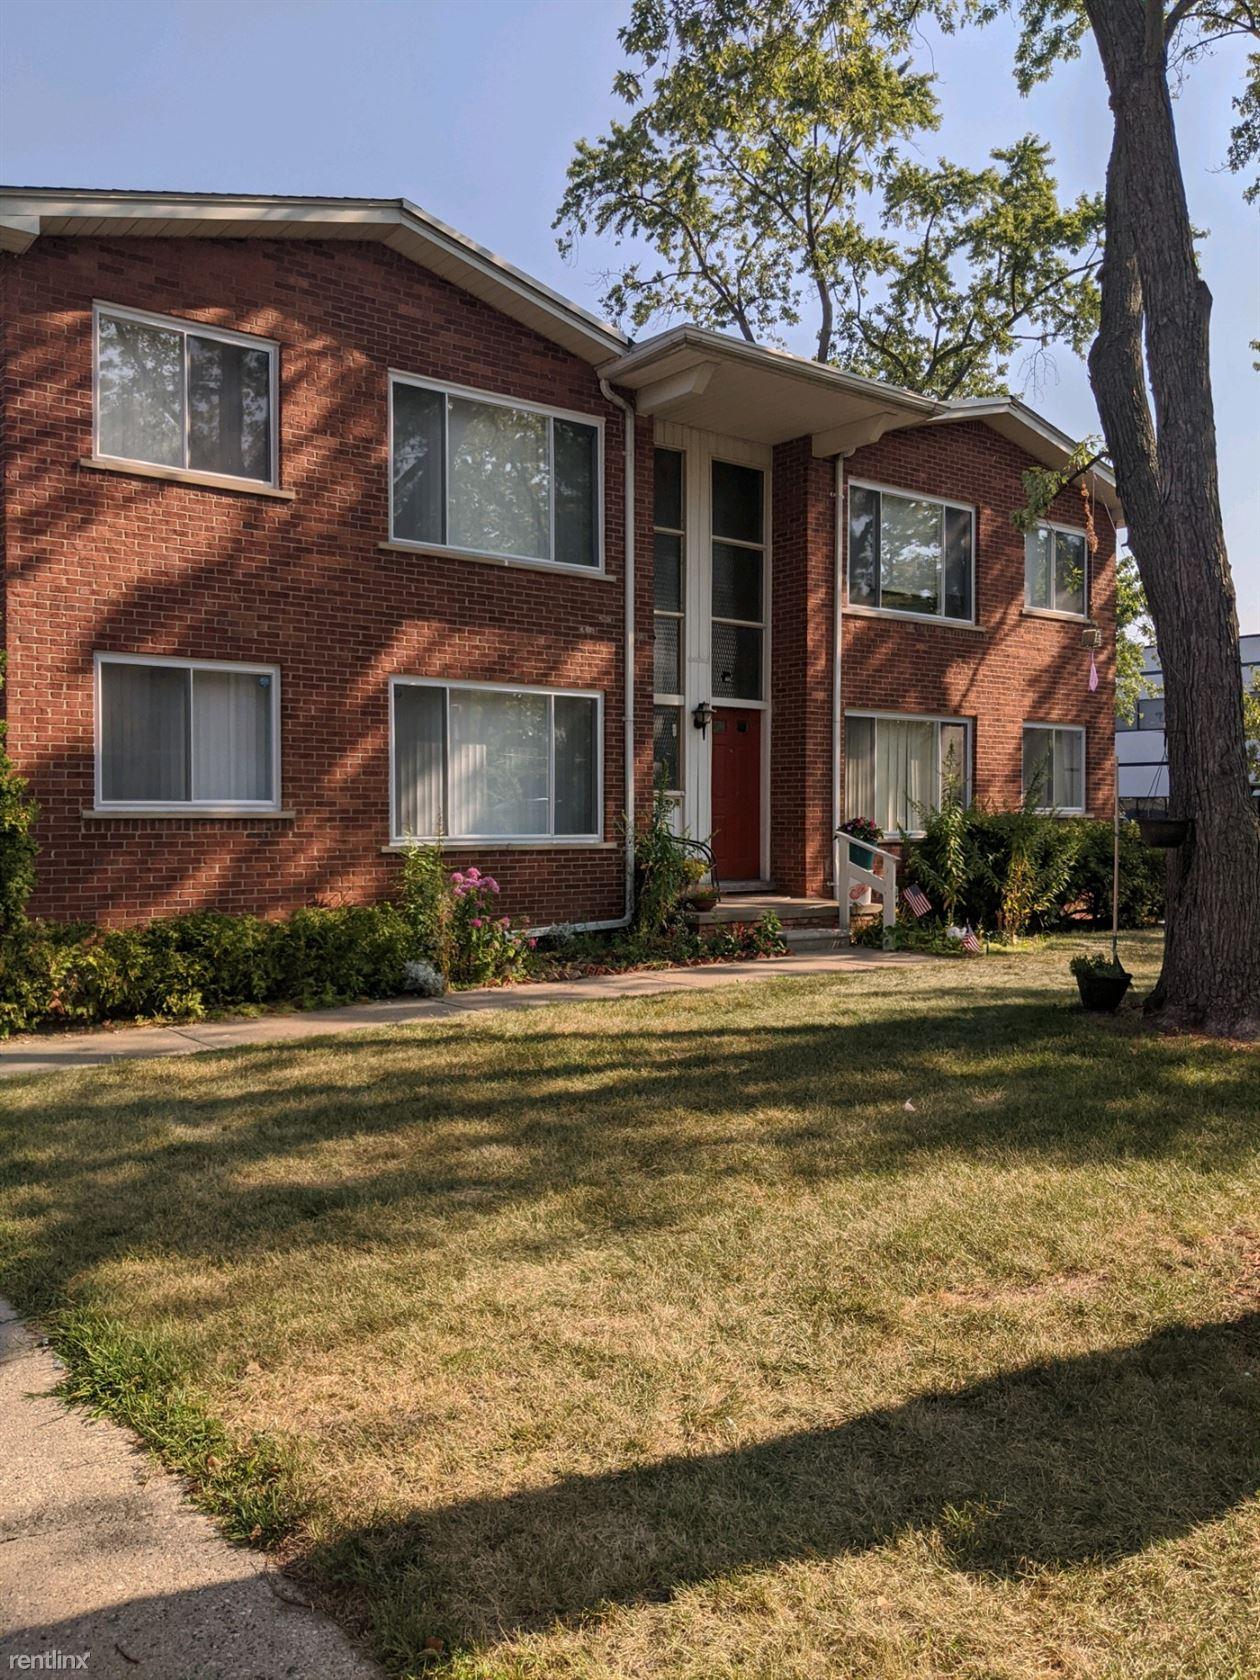 8310 Hall Rd, Utica, MI - $775 USD/ month